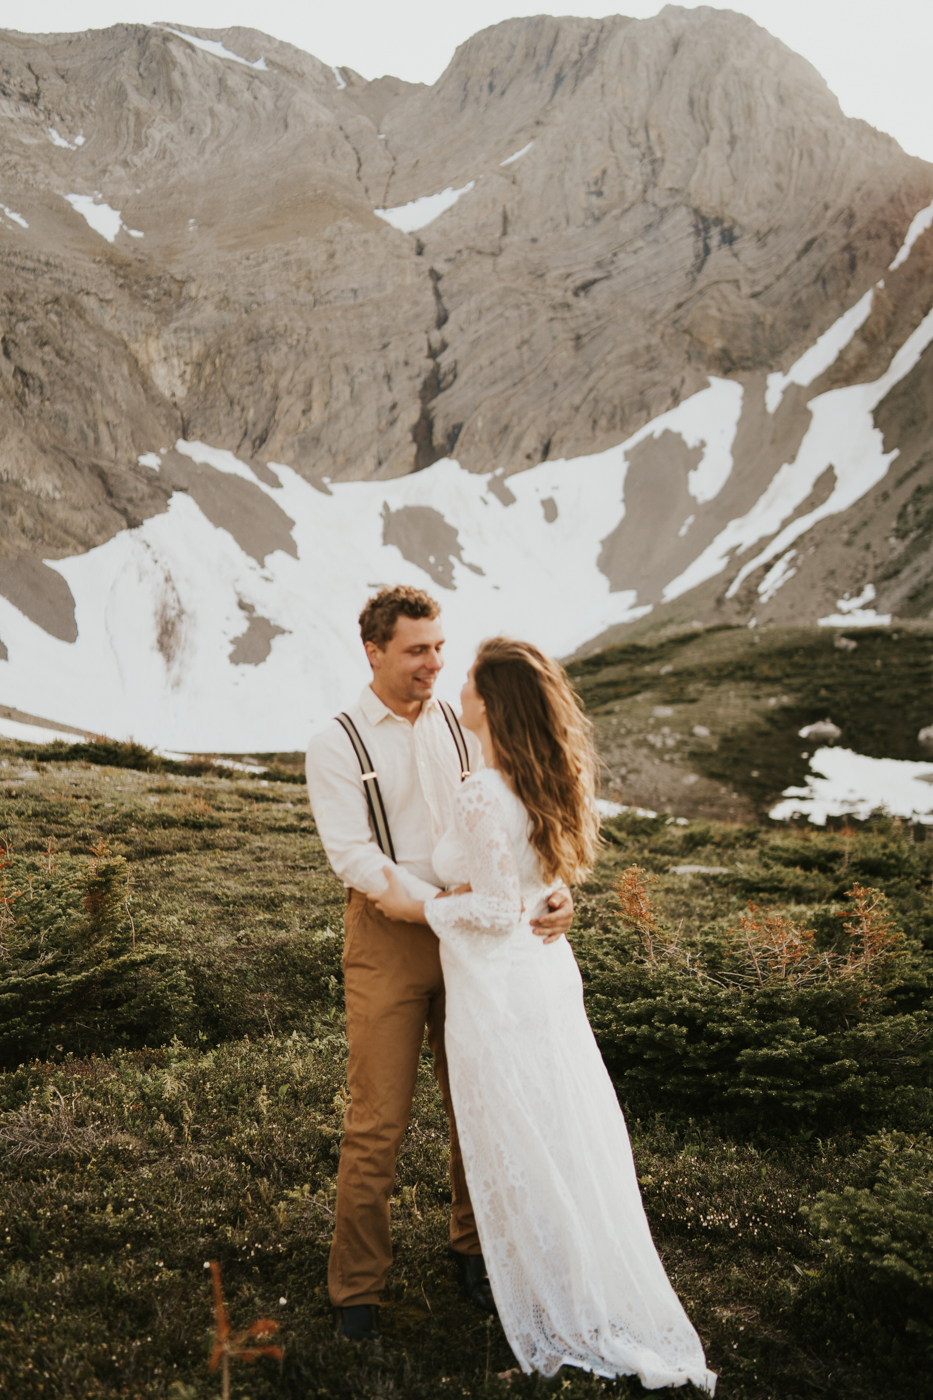 tyraephotography_photographer_wedding_elopement_engagement_photography-08024.jpg